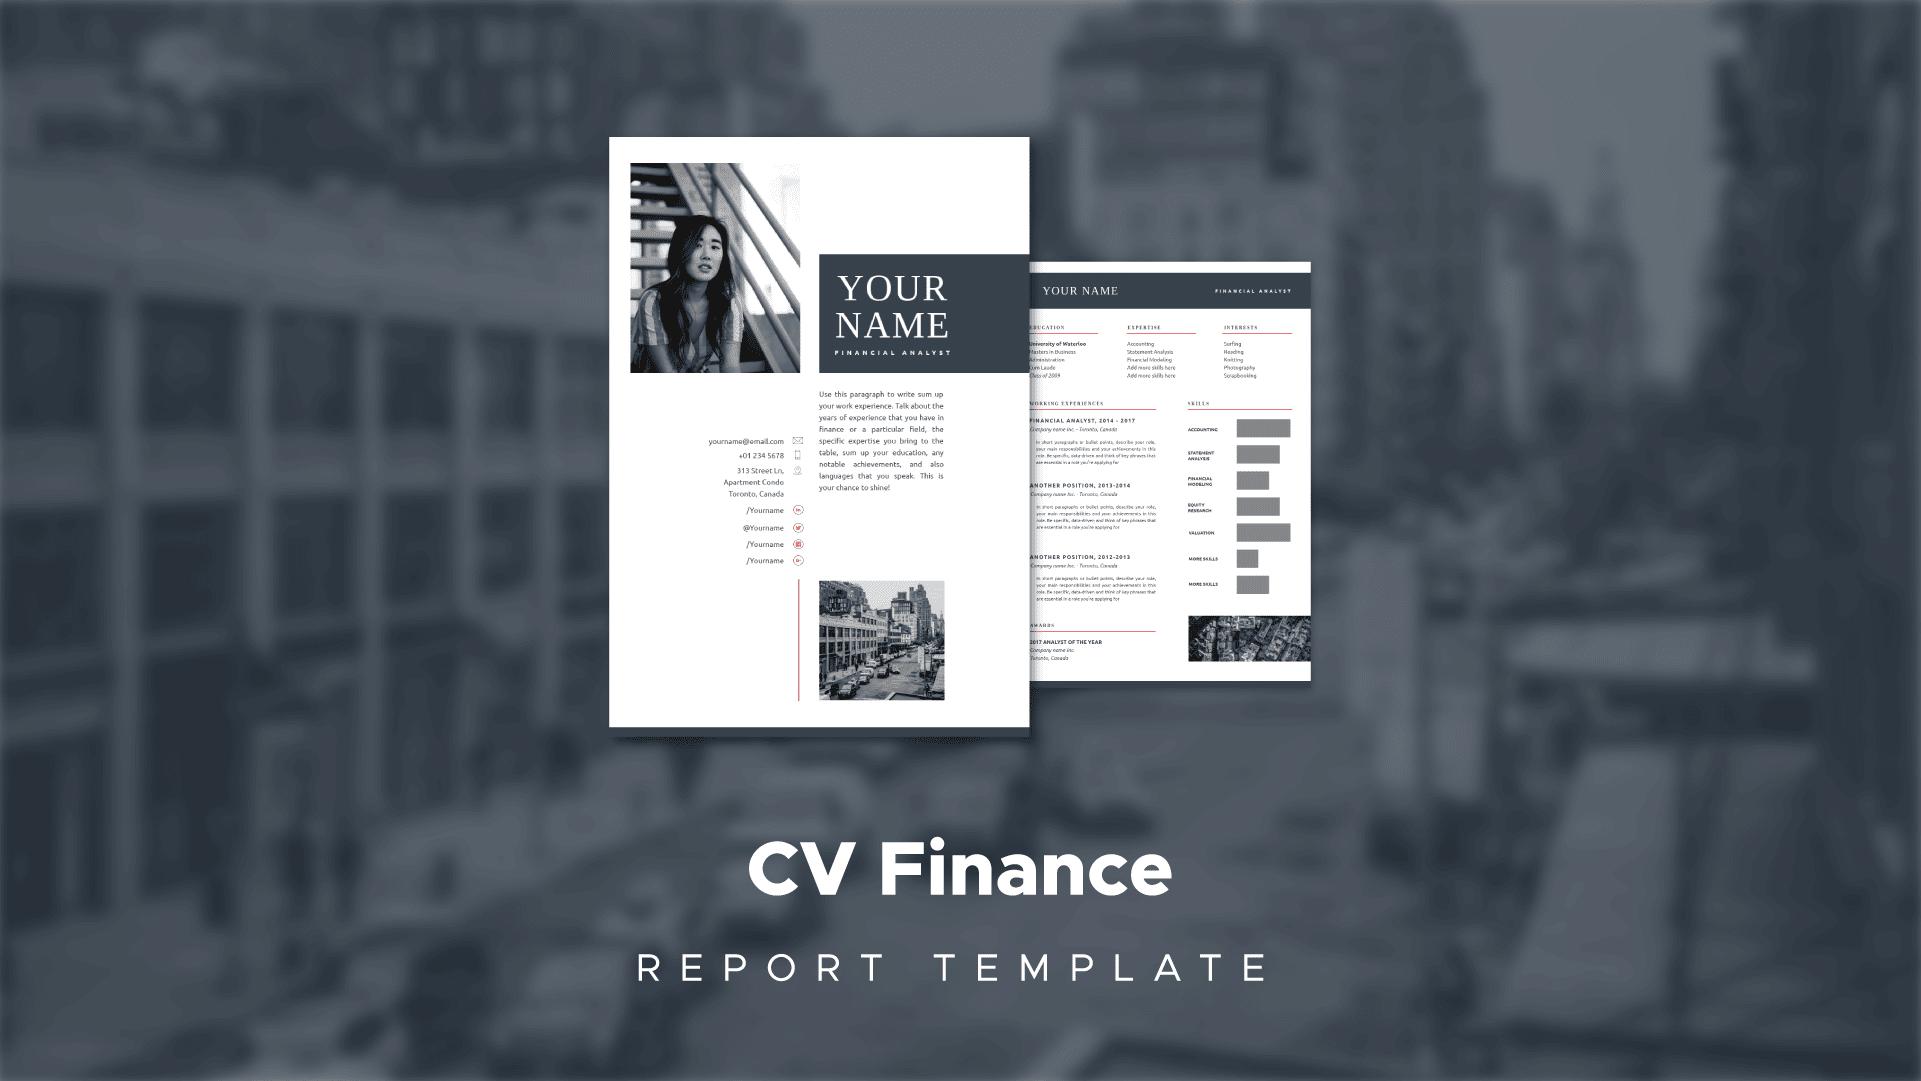 templates-visual_report_1146-1-6807901